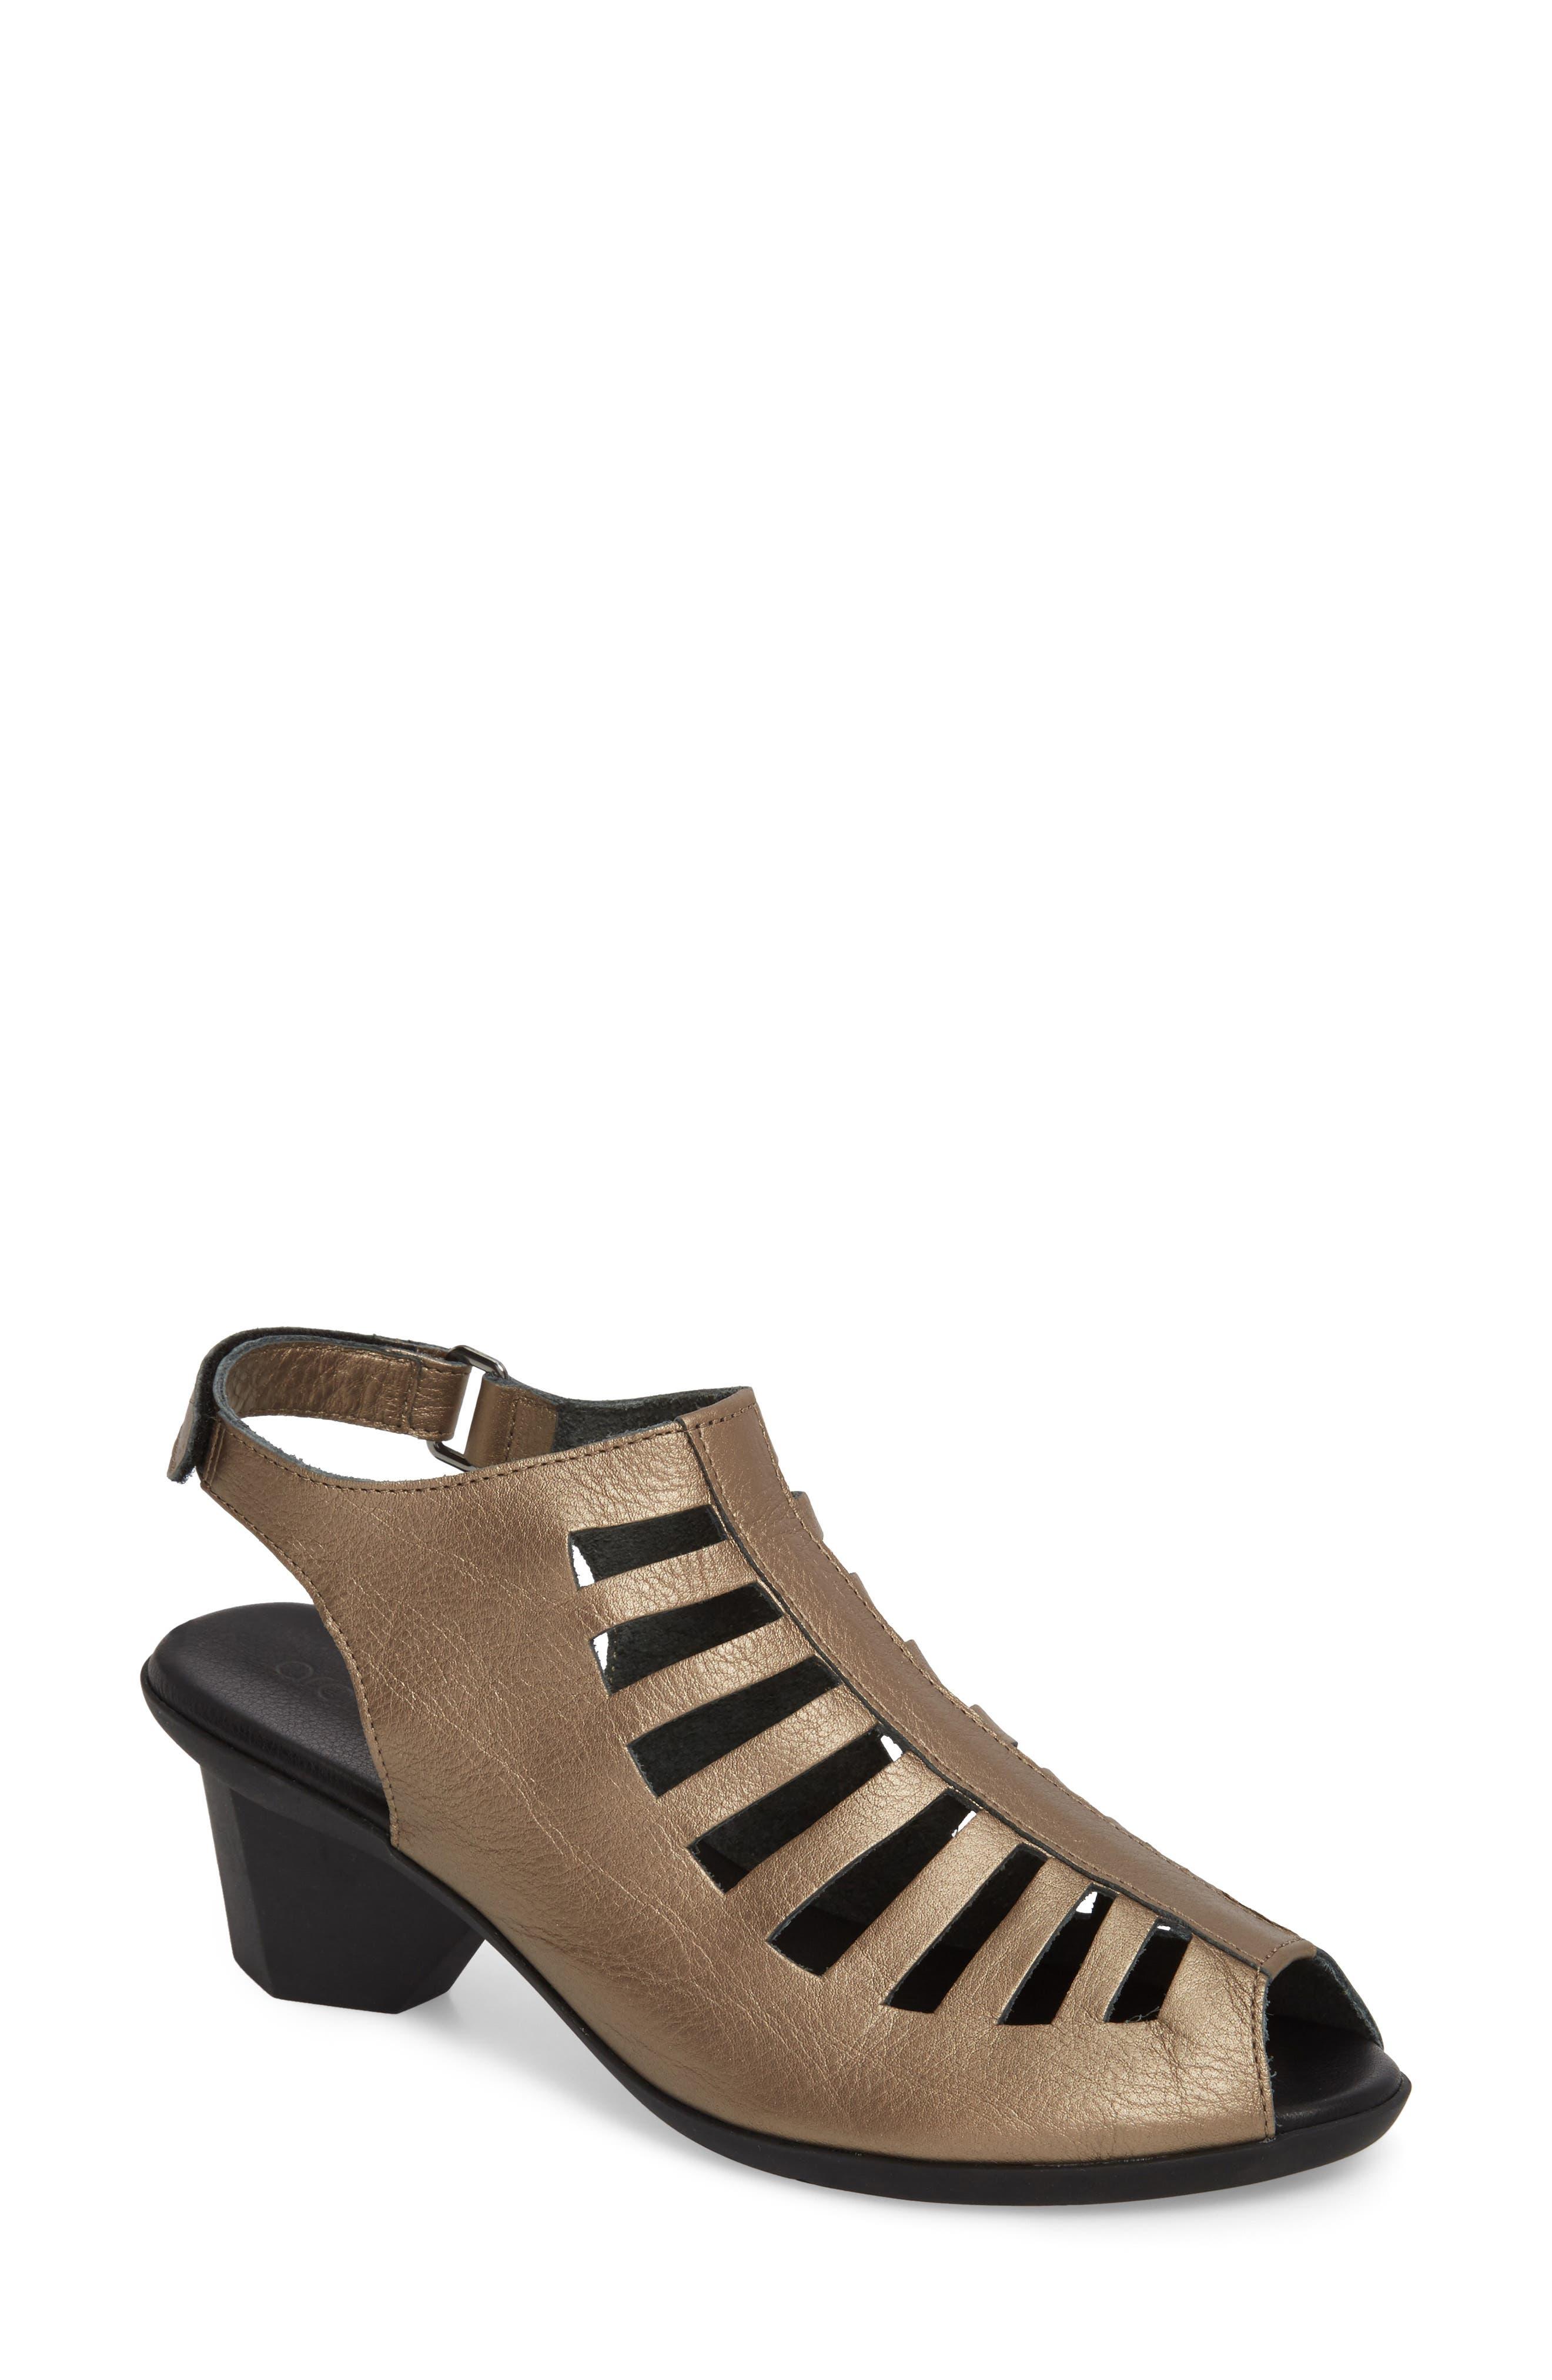 Enexor Sandal,                         Main,                         color, Moon/ Noir Leather